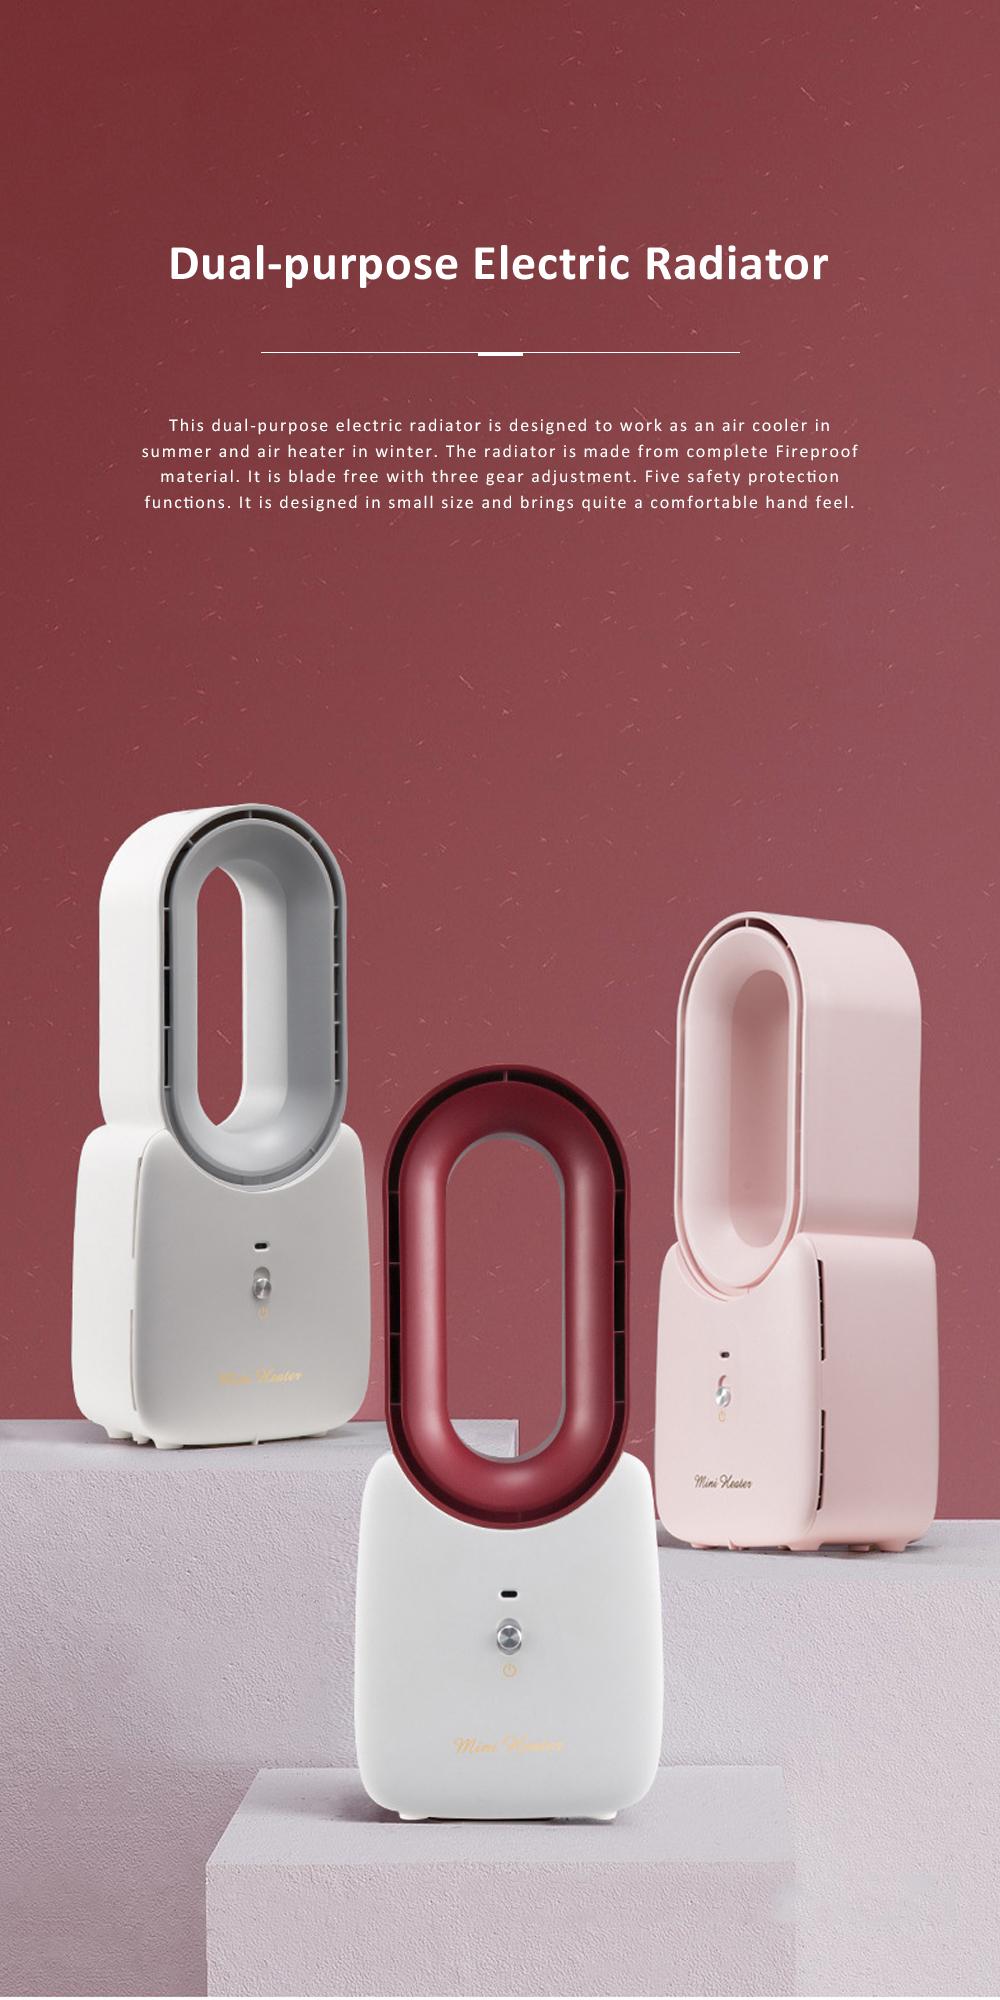 Home Office Desktop Heater for Energy-saving Mini Warmer Blade Free Dual-purpose Electric Radiator 0